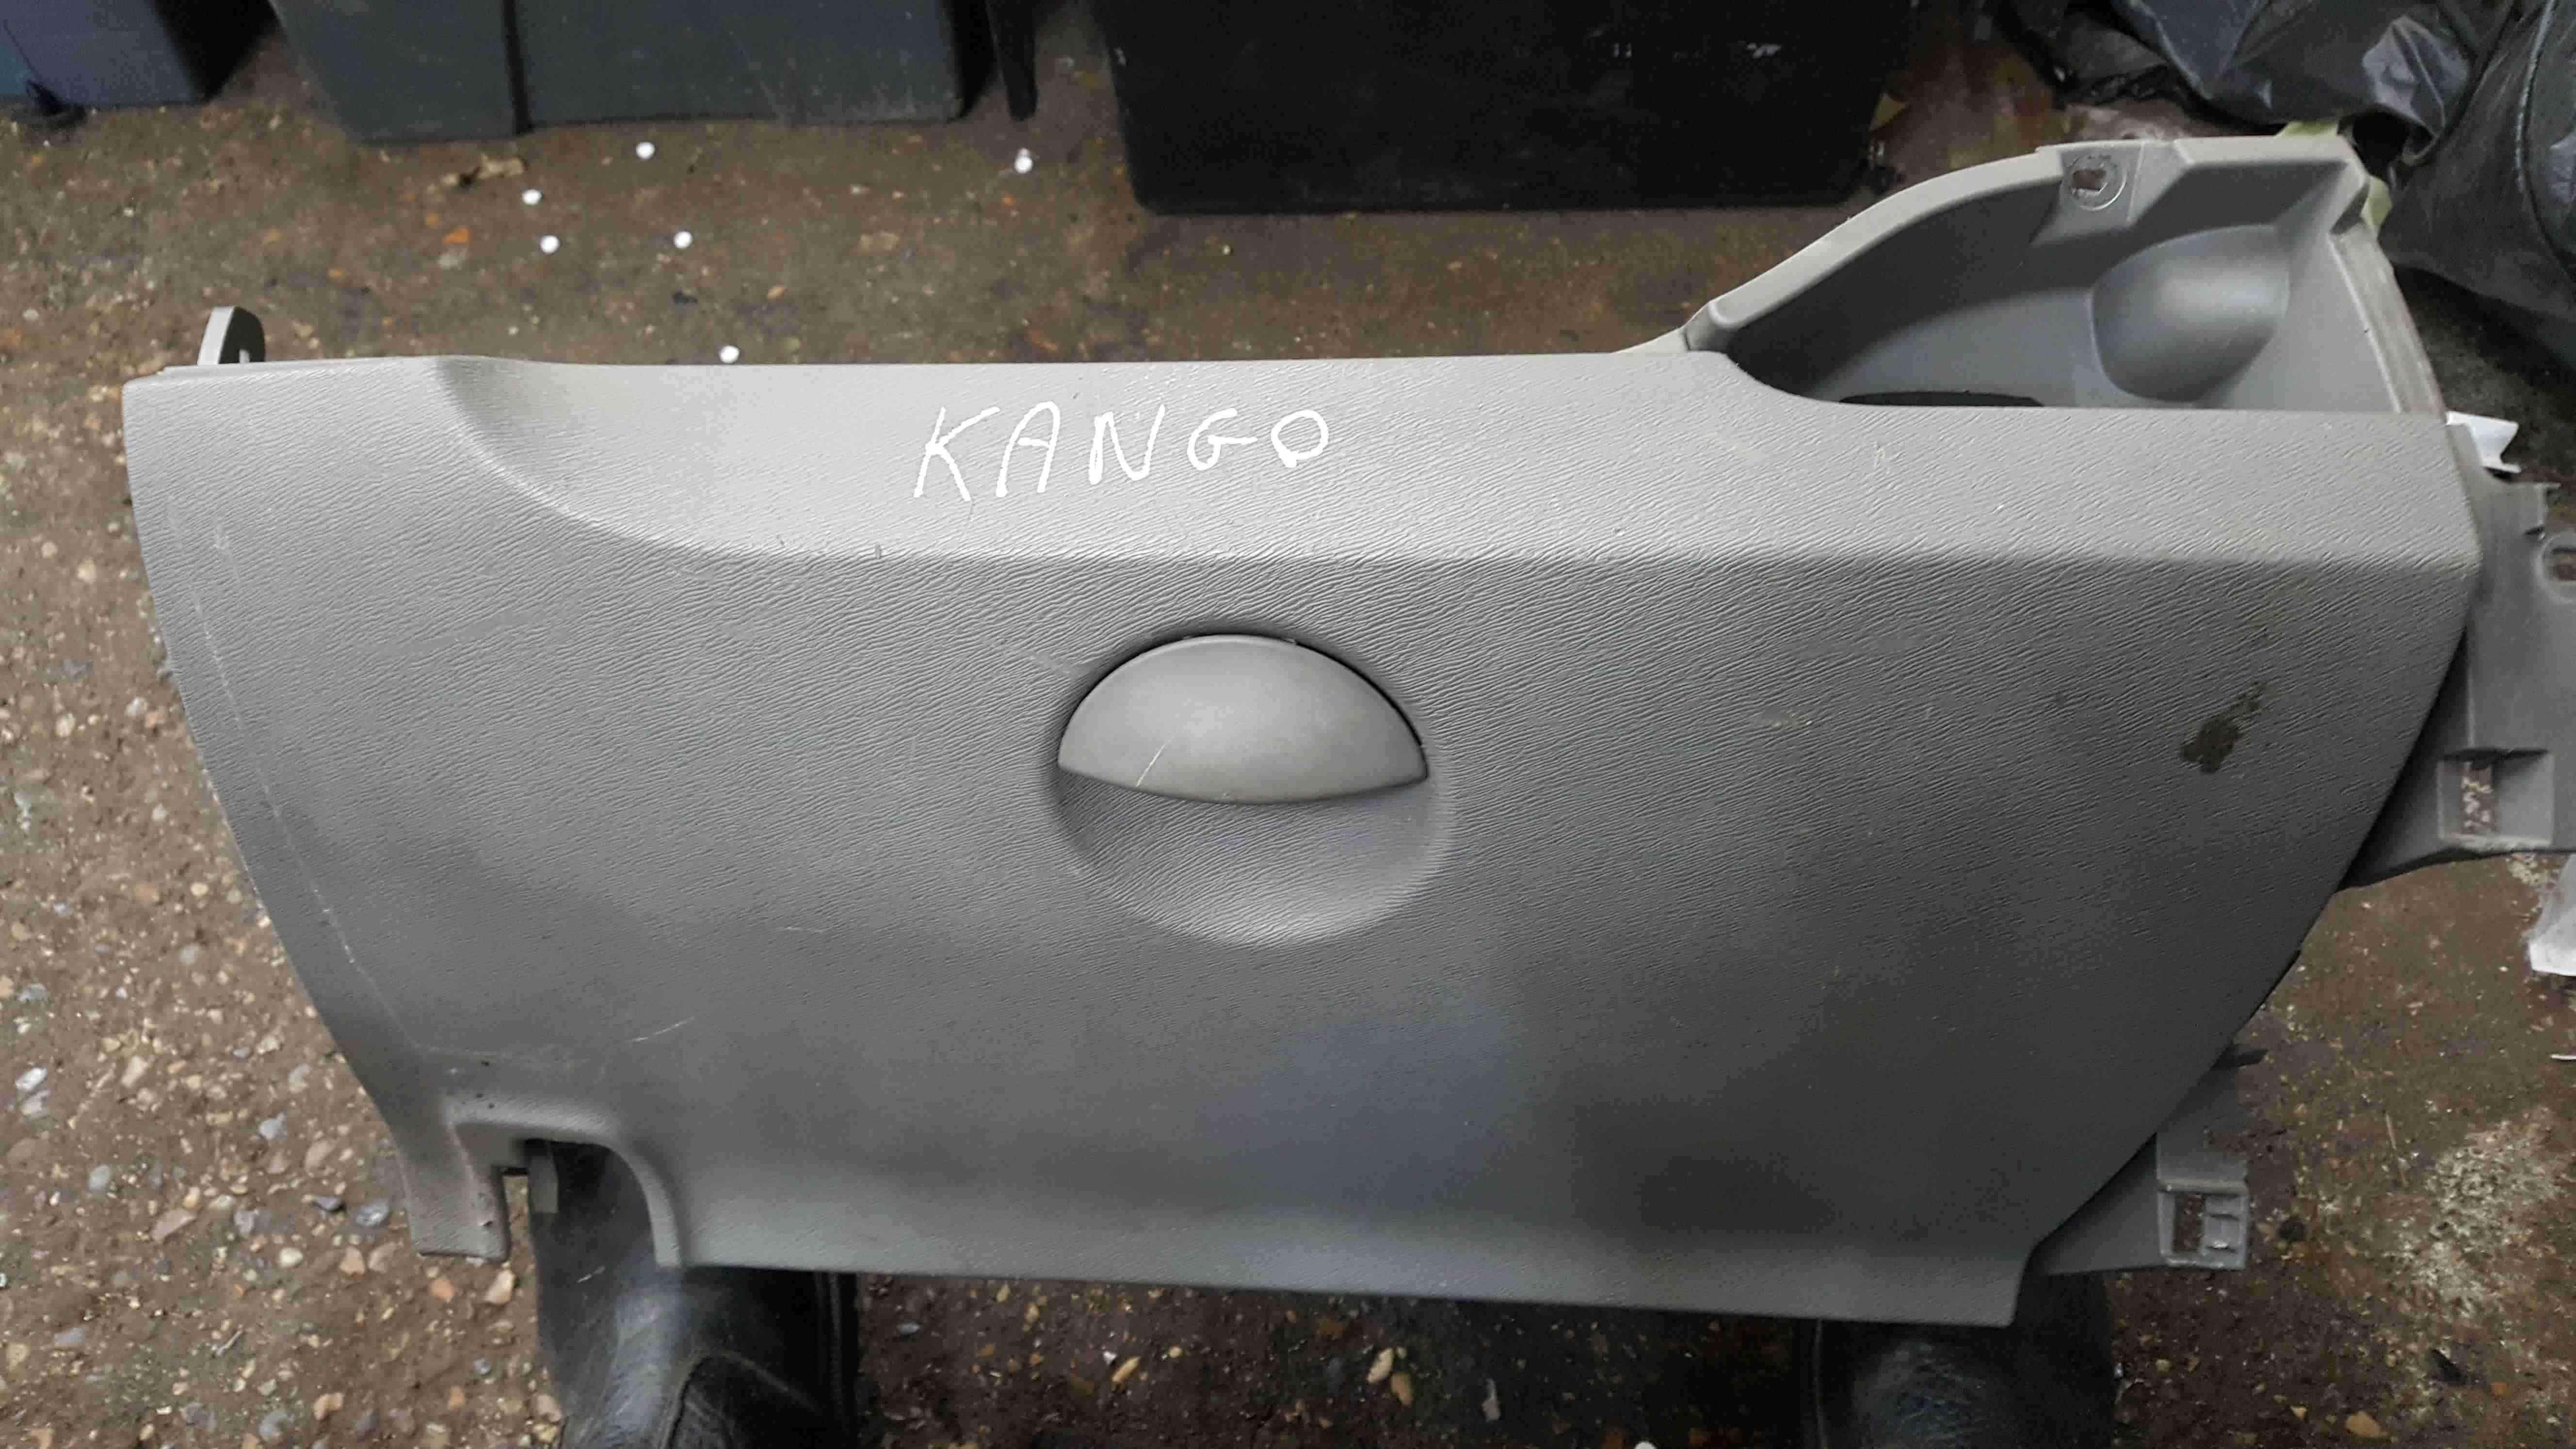 Renault Kangoo 2007-2017 Dashboard Glove Box Stroage 8200451649